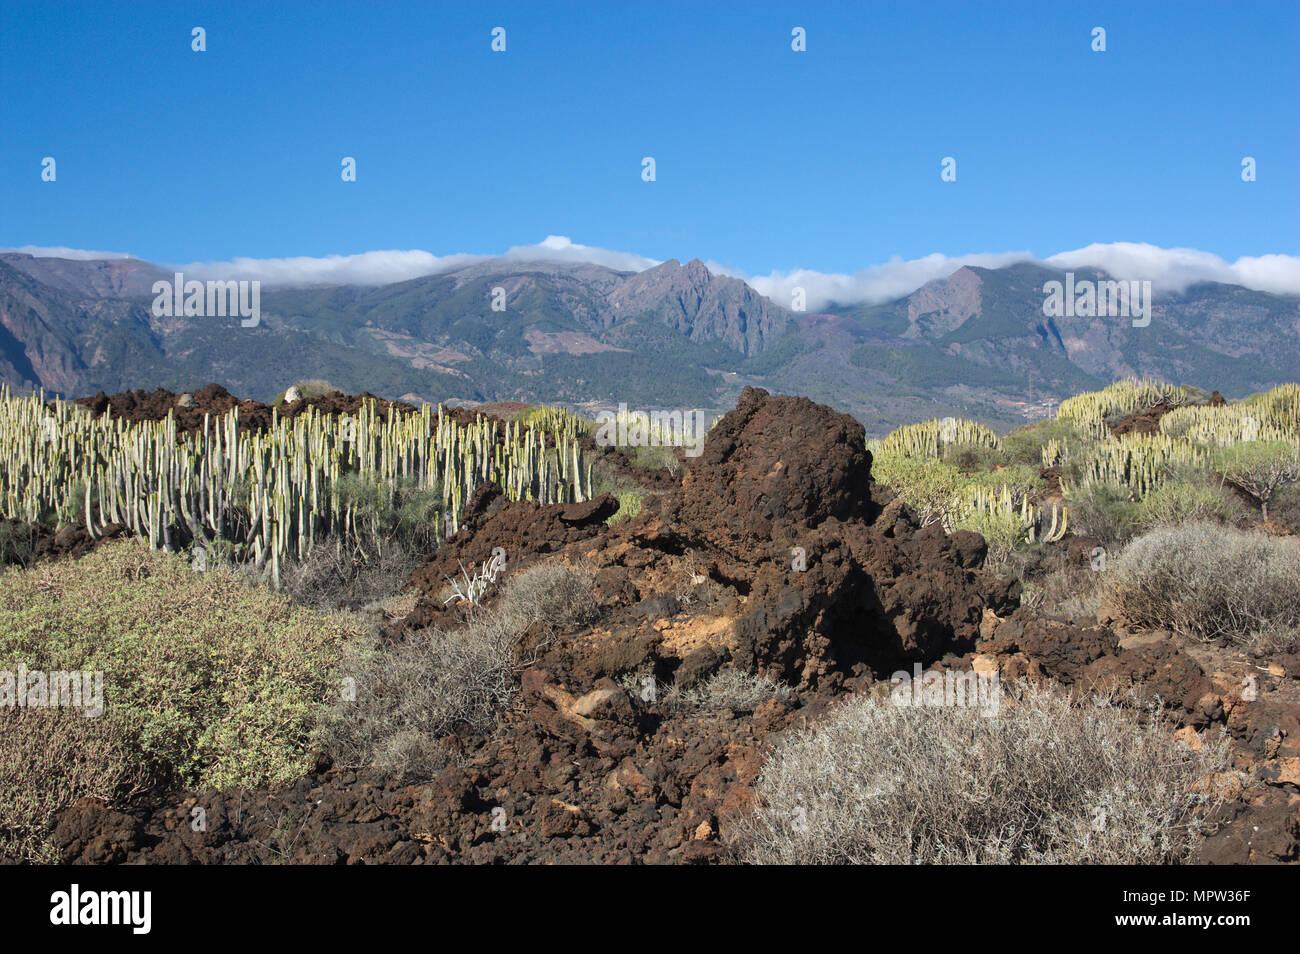 View of the volcanic mountains of Tenerife in the Malpaís. Santa Cruz de Tenerife. Spain - Stock Image